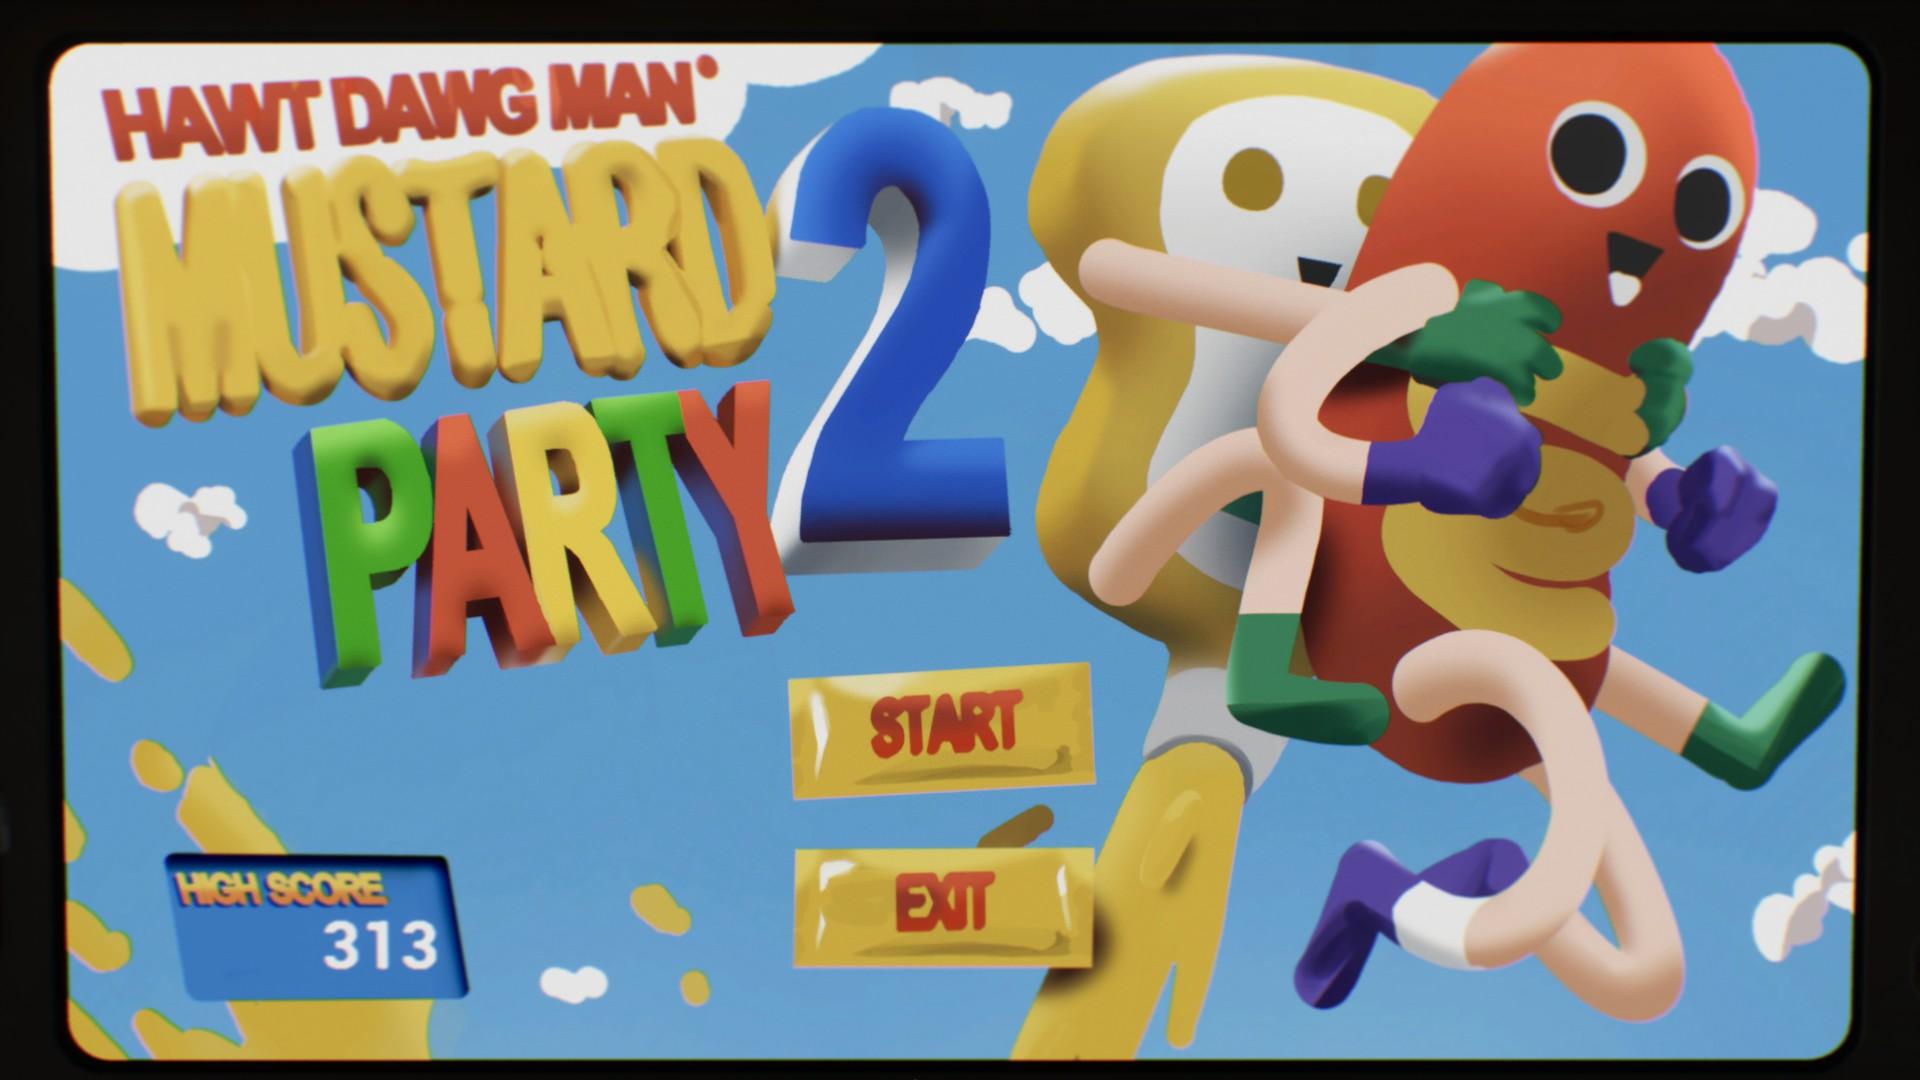 Hawt Dawg Man Game Title